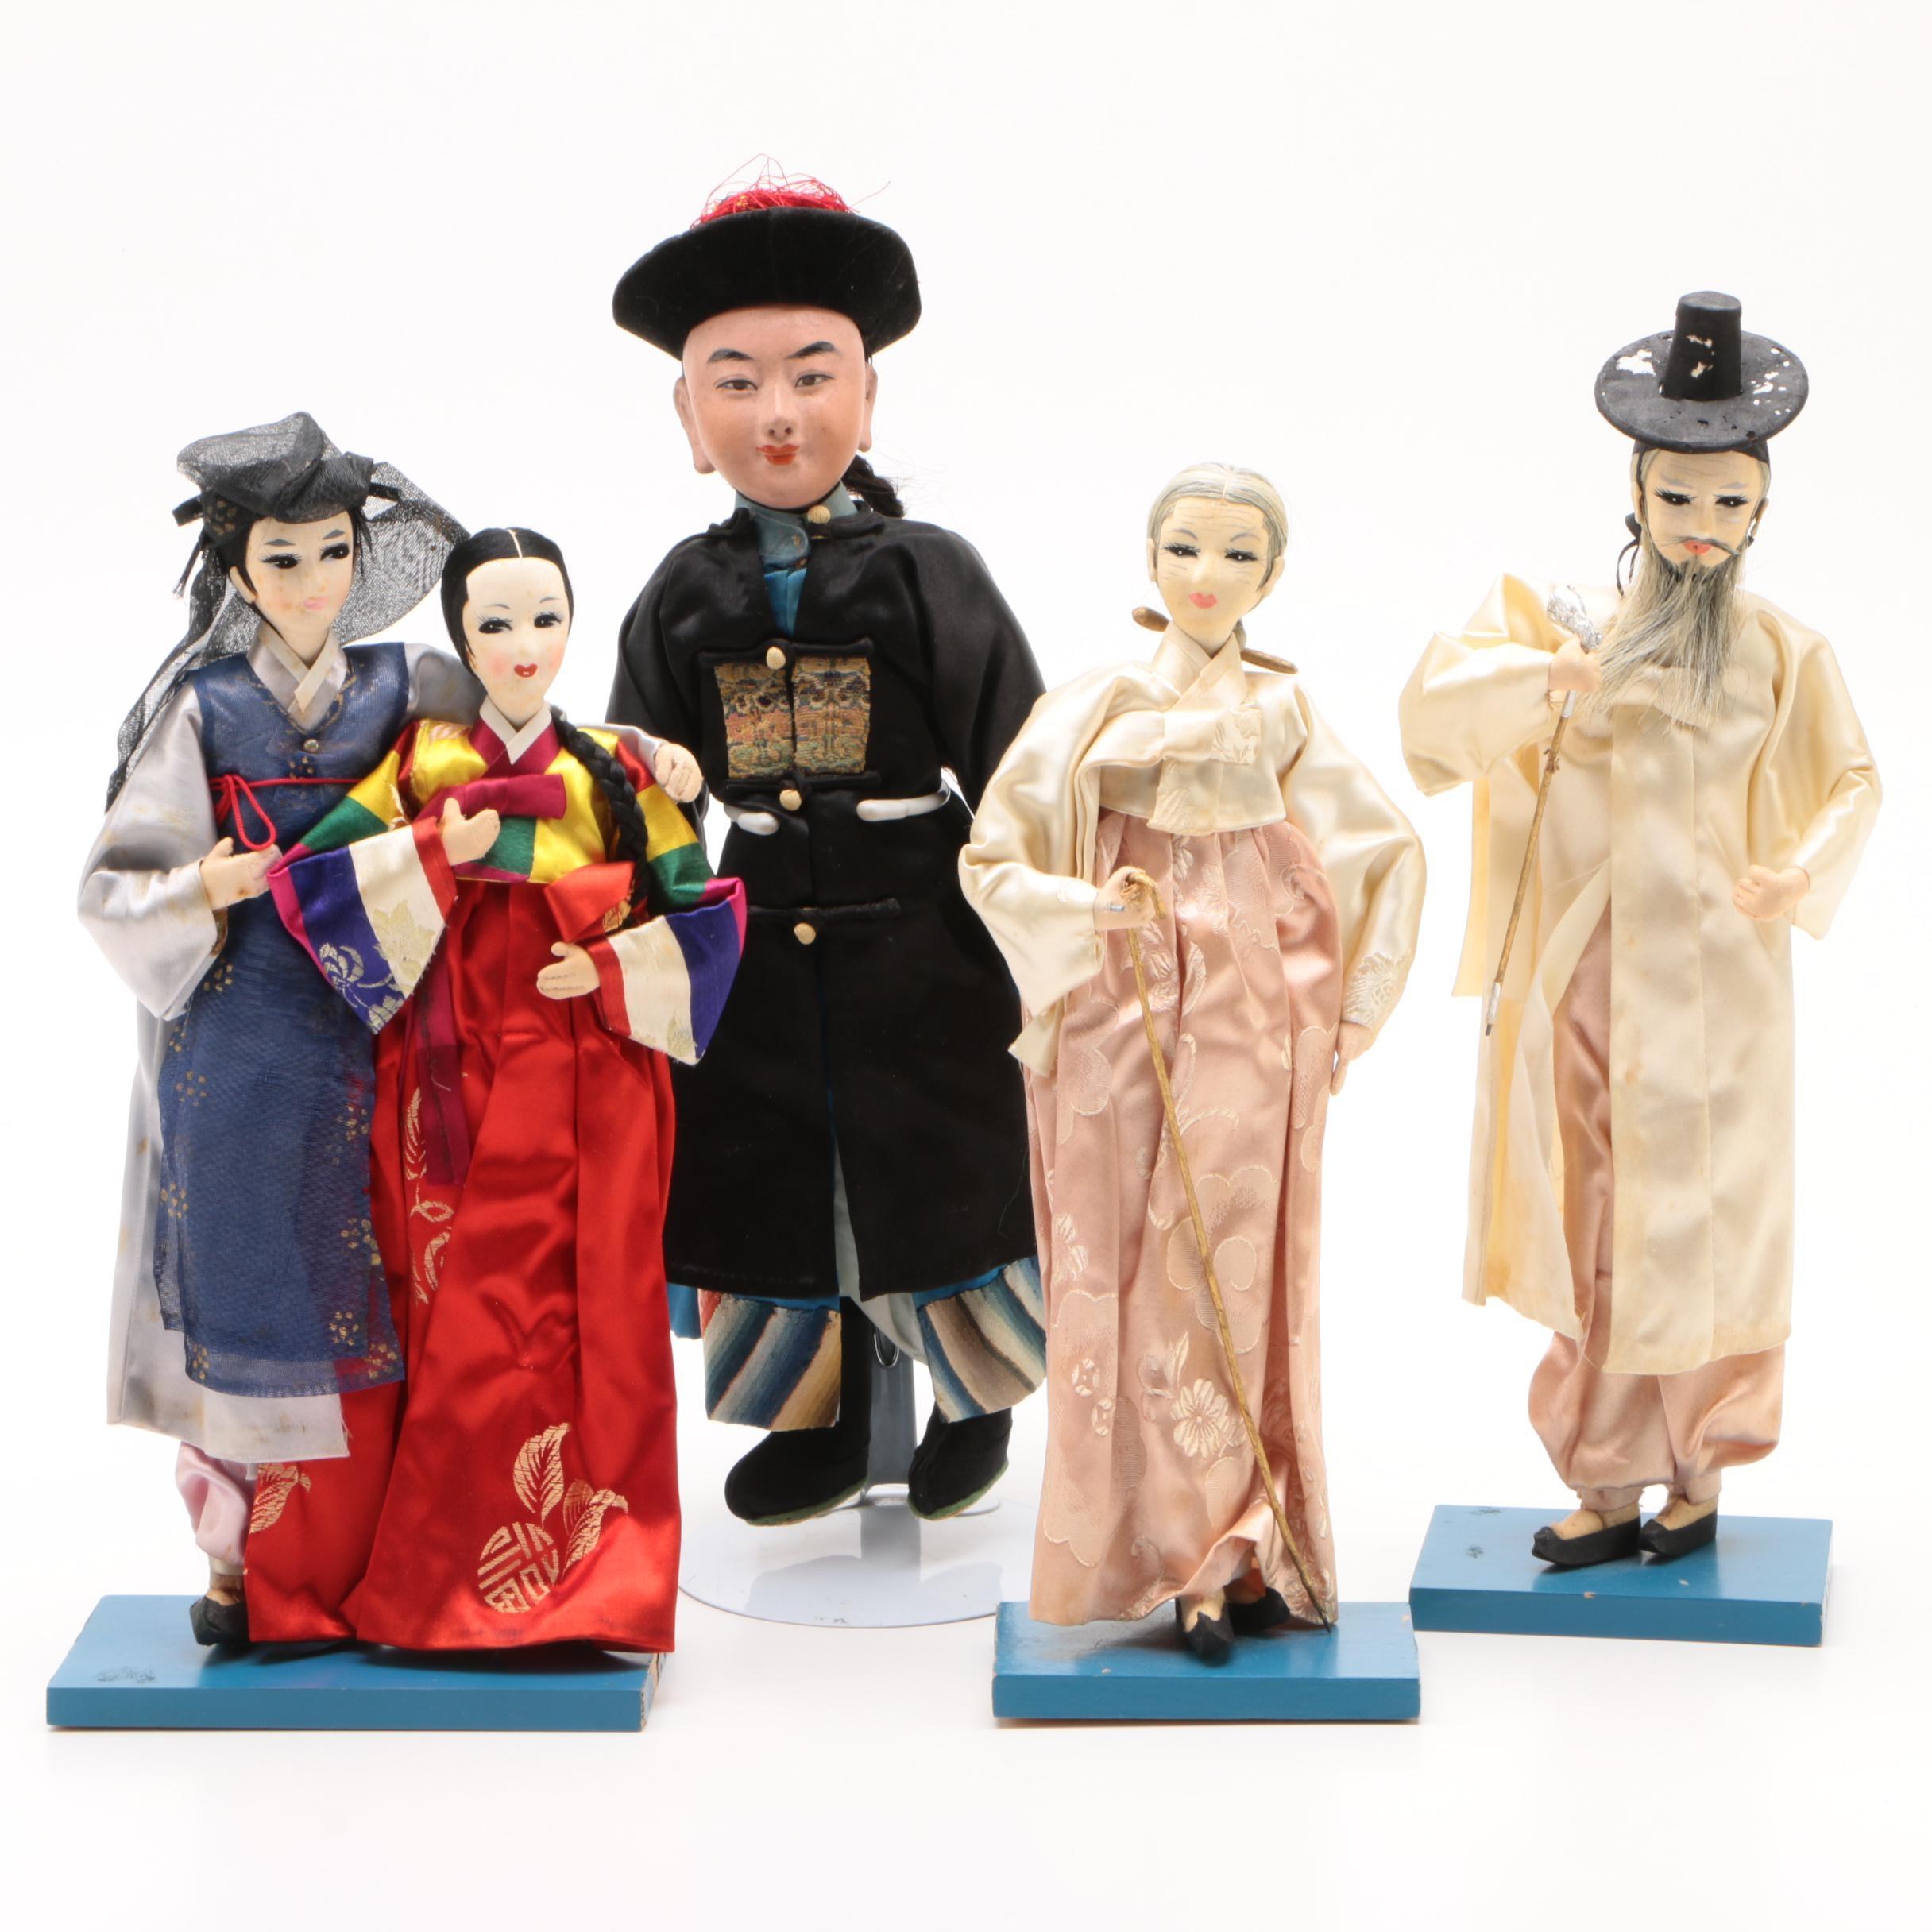 Min Ye Korean Costume Dolls Including Bride and Groom